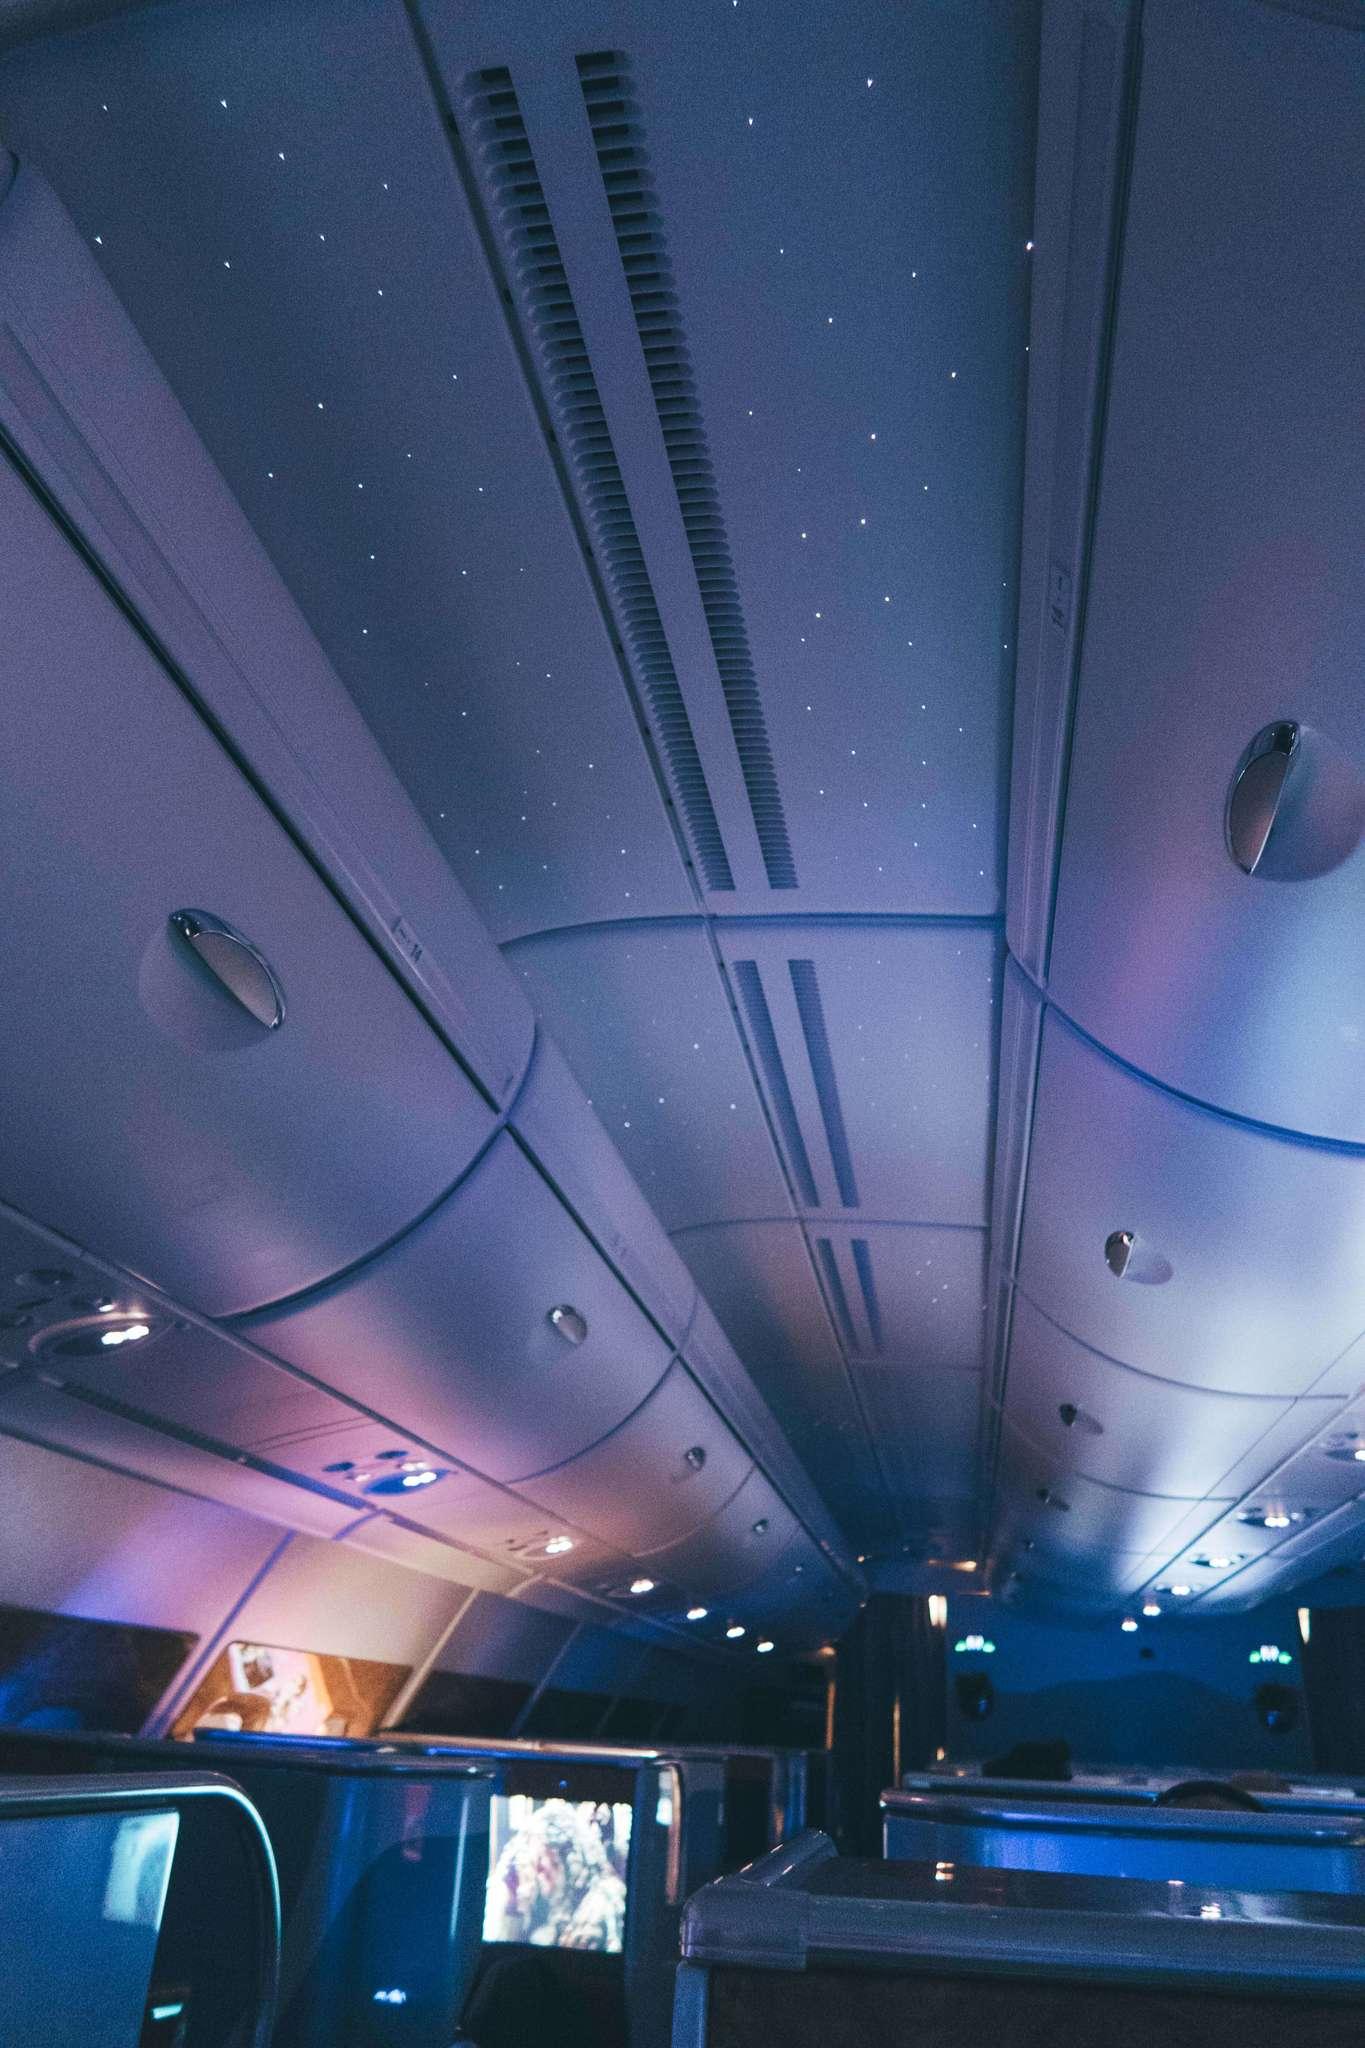 Ceiling on Emirates